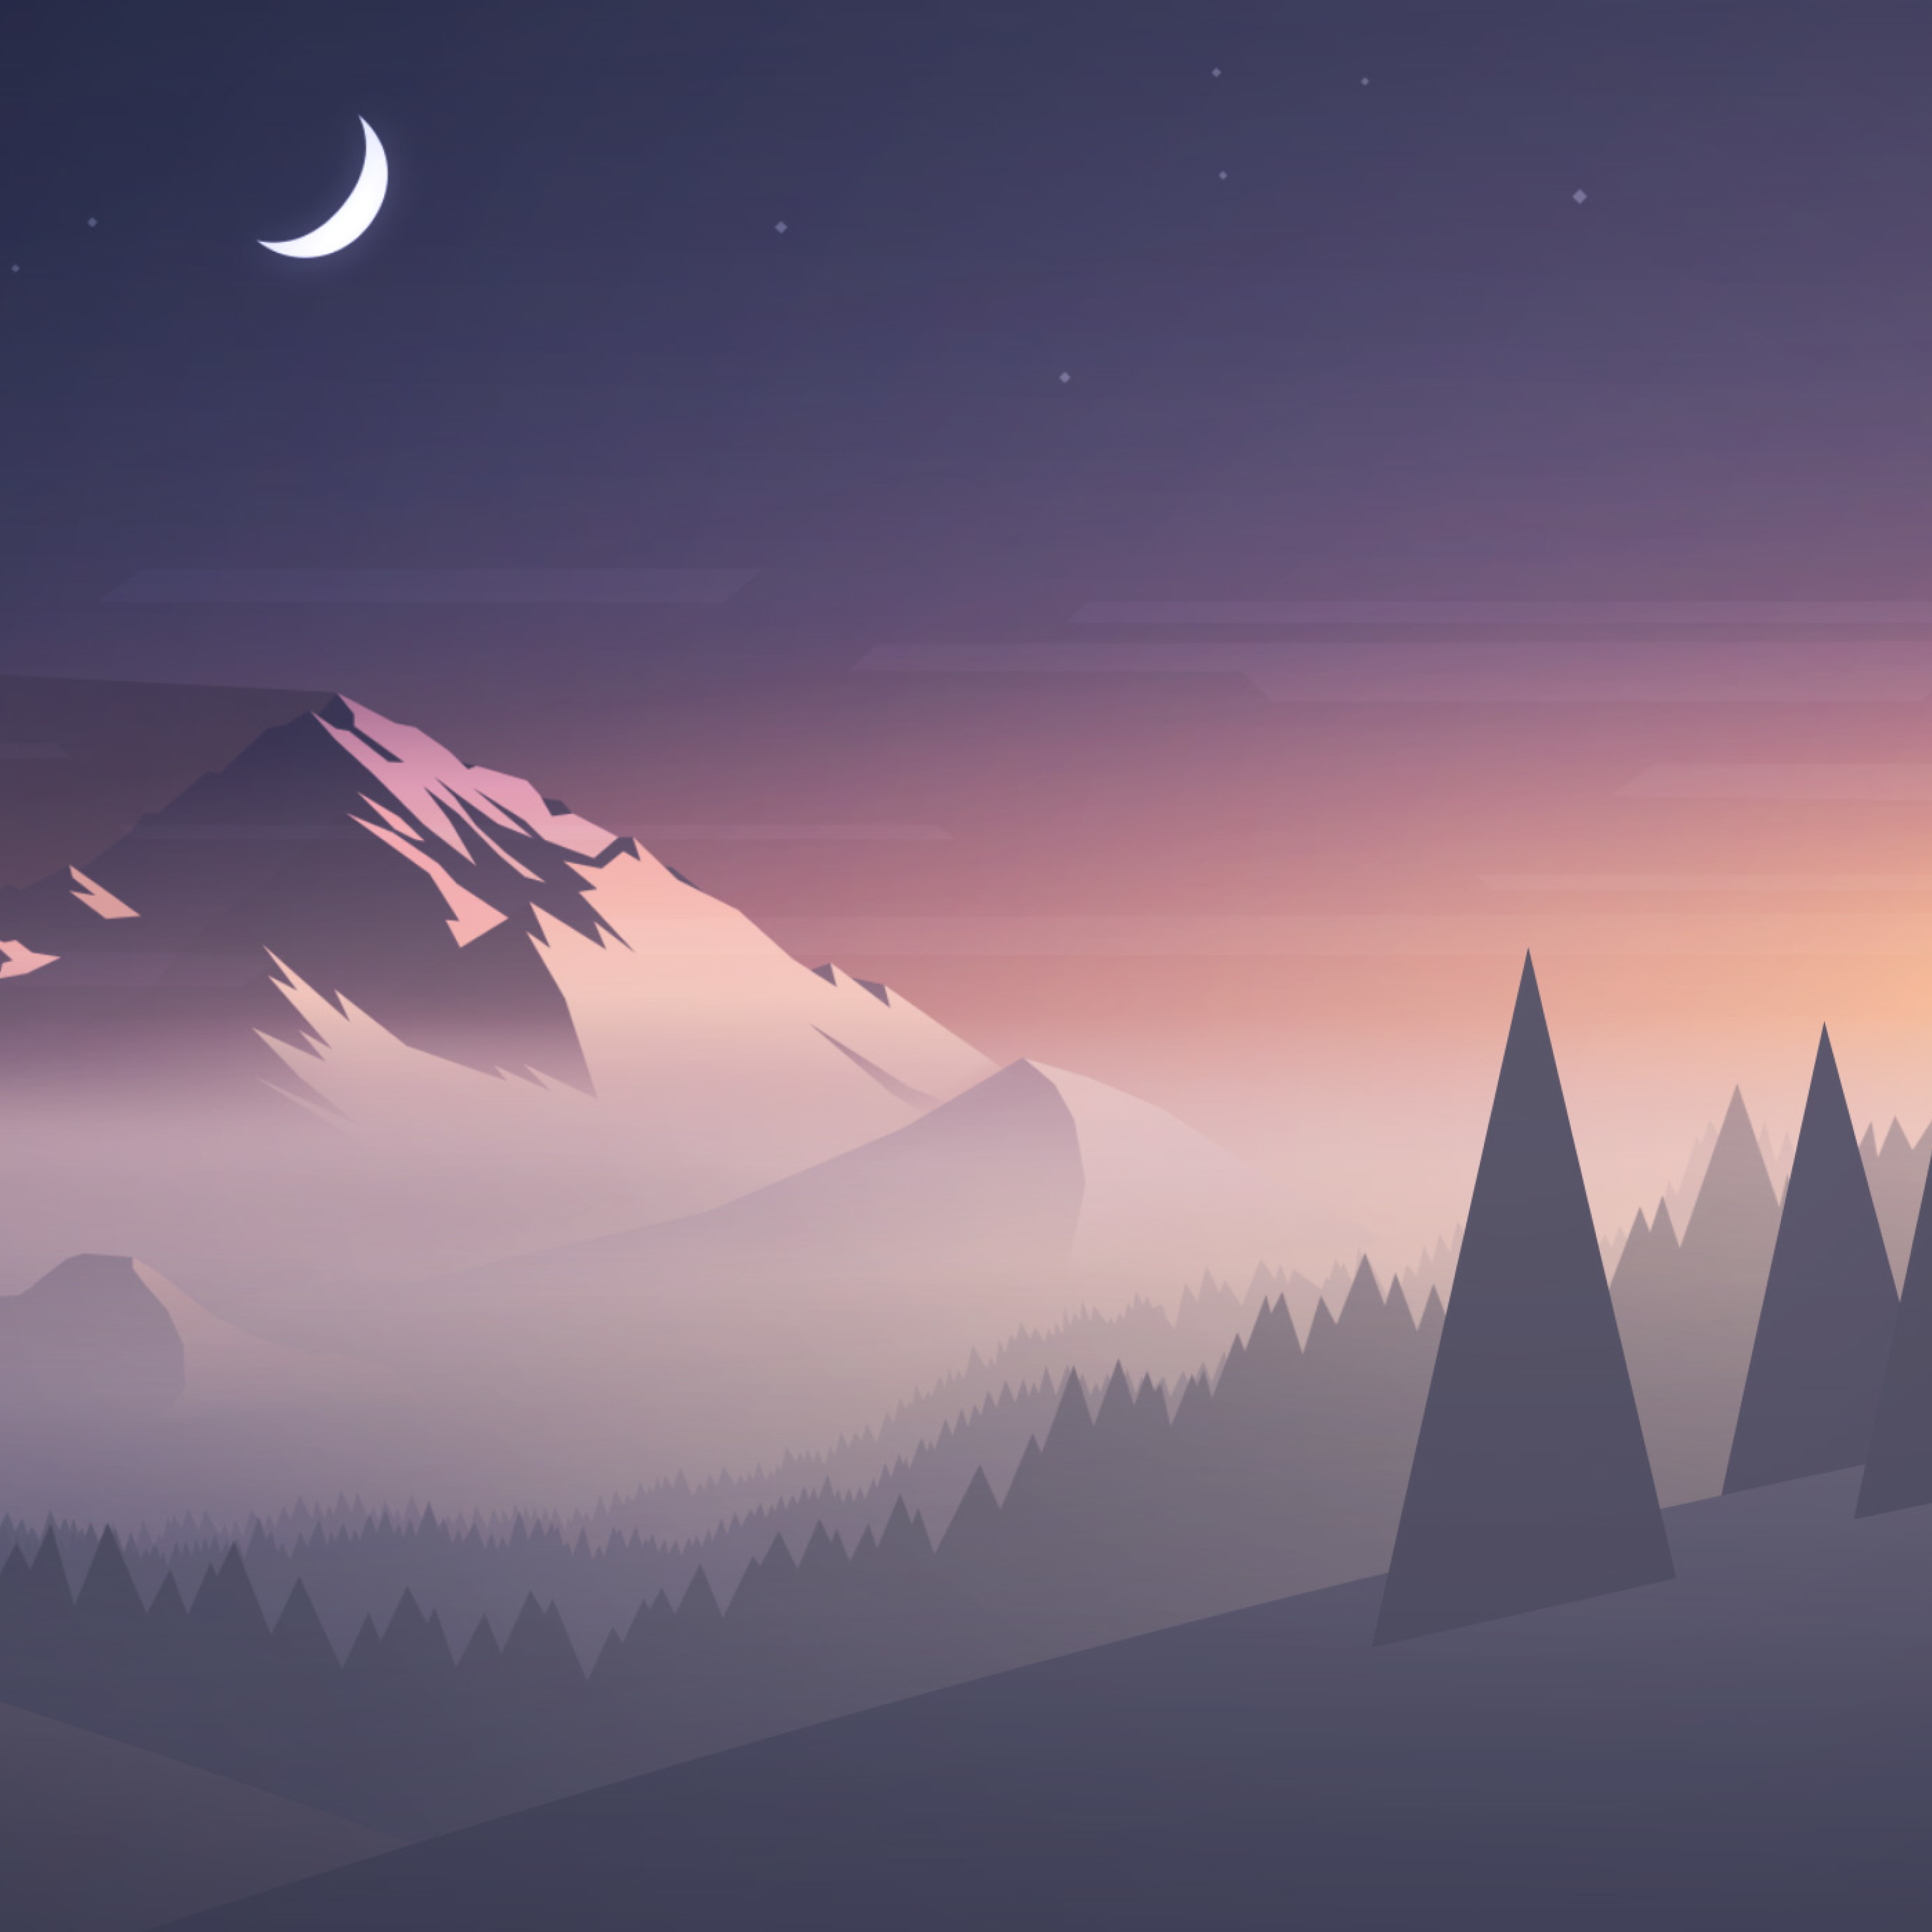 Good Wallpaper Mountain Ipad Pro - mountains-moon-trees-minimal_58540_2932x2932  Best Photo Reference_113615.jpg